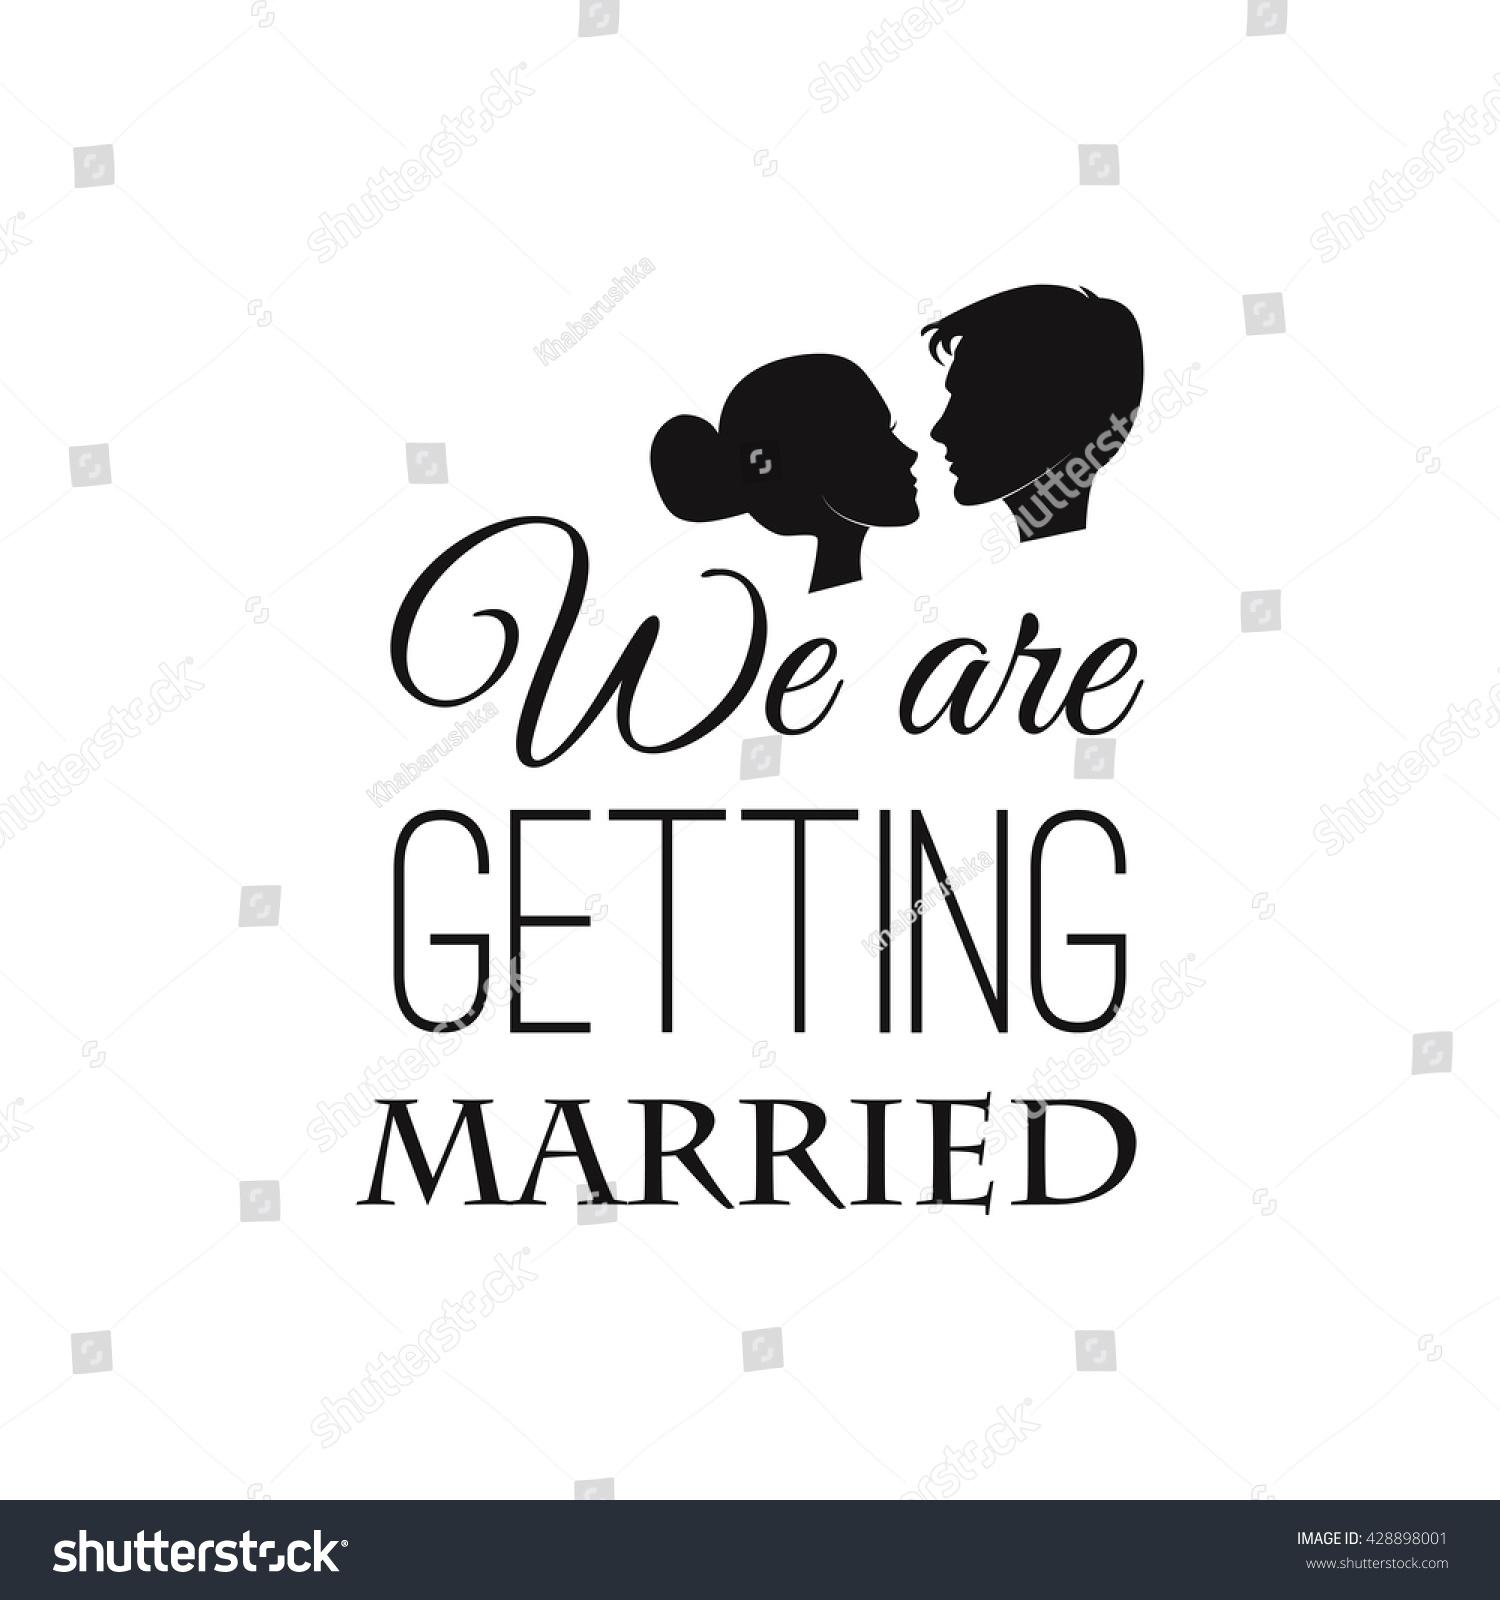 Wedding invitation vector silhouette bride groom stock vector wedding invitation vector silhouette bride groom wedding invitation profile of wedding couple profile stopboris Images